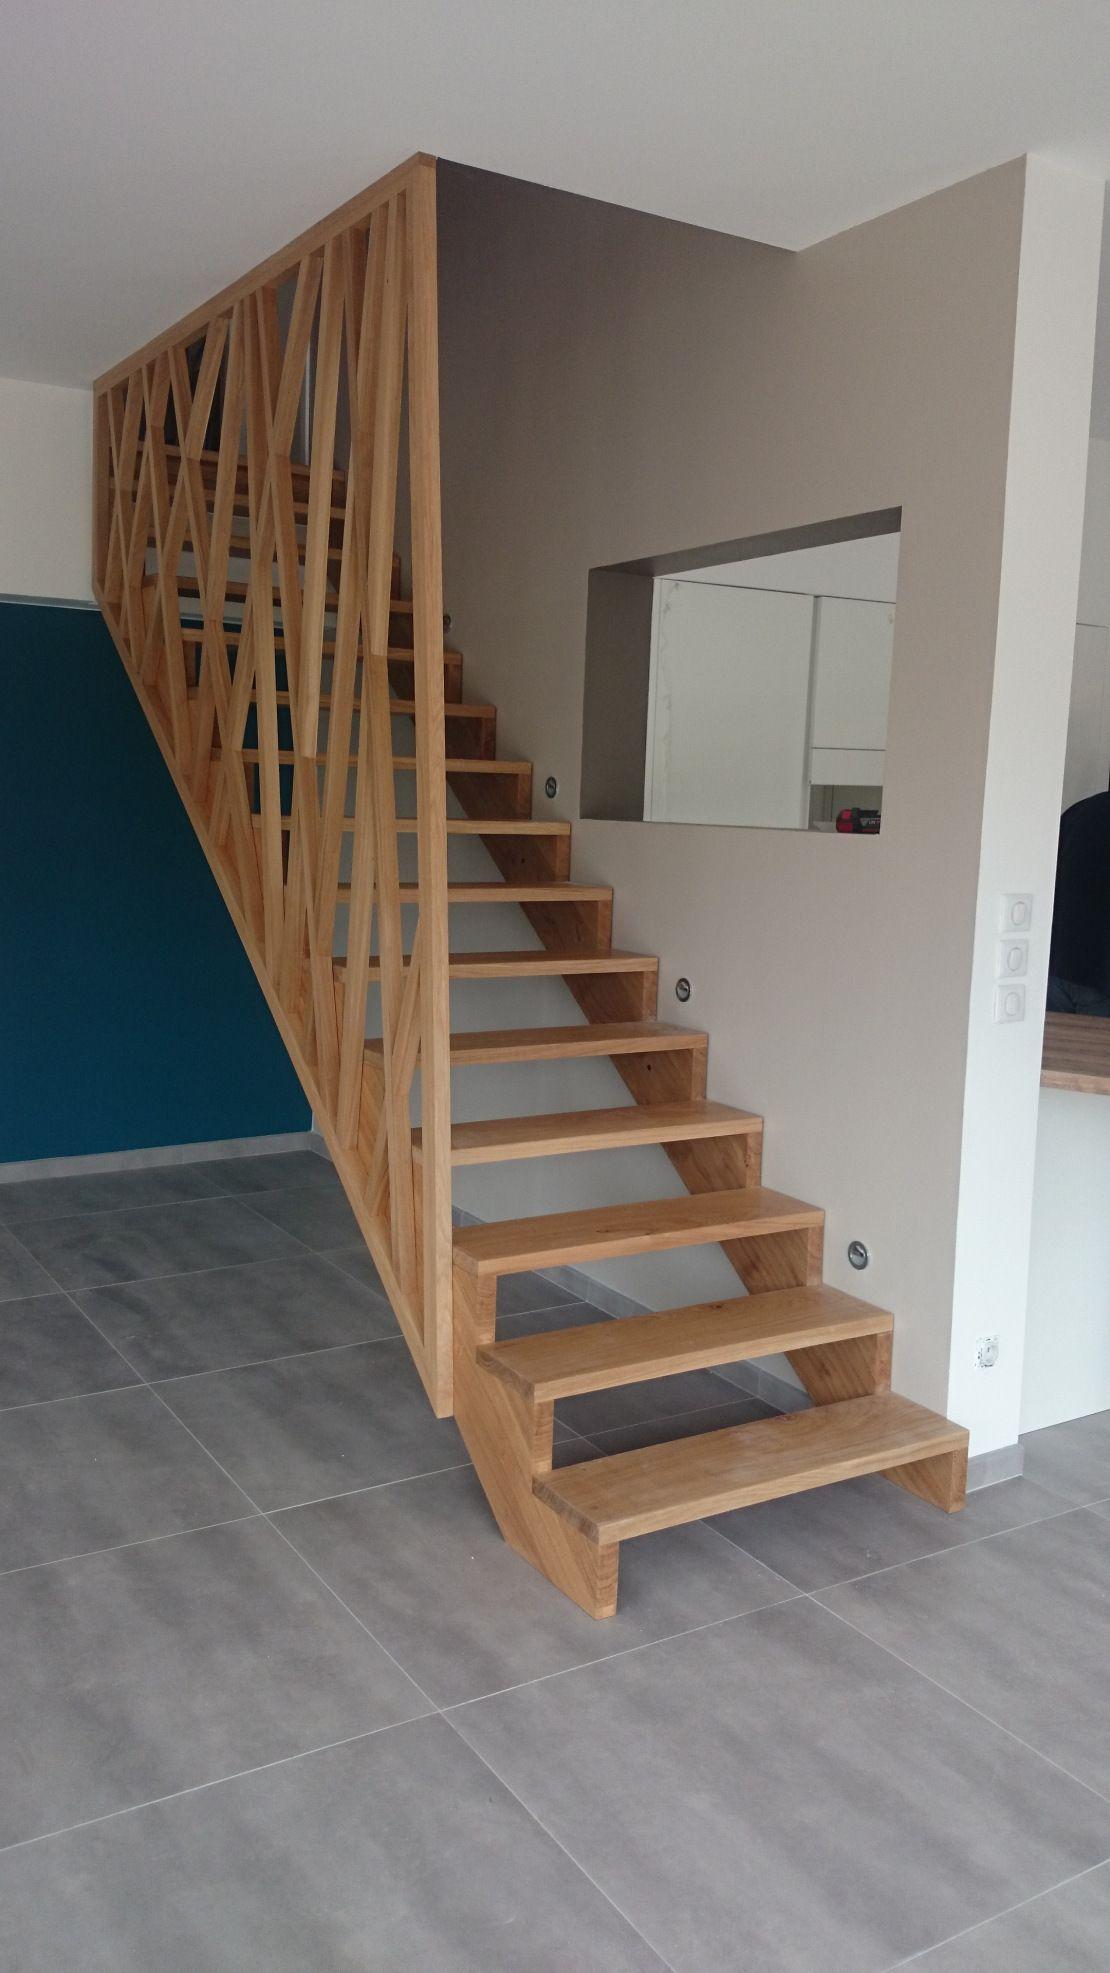 Wordpress Com Escaliers Interieur Idees Escalier Escalier